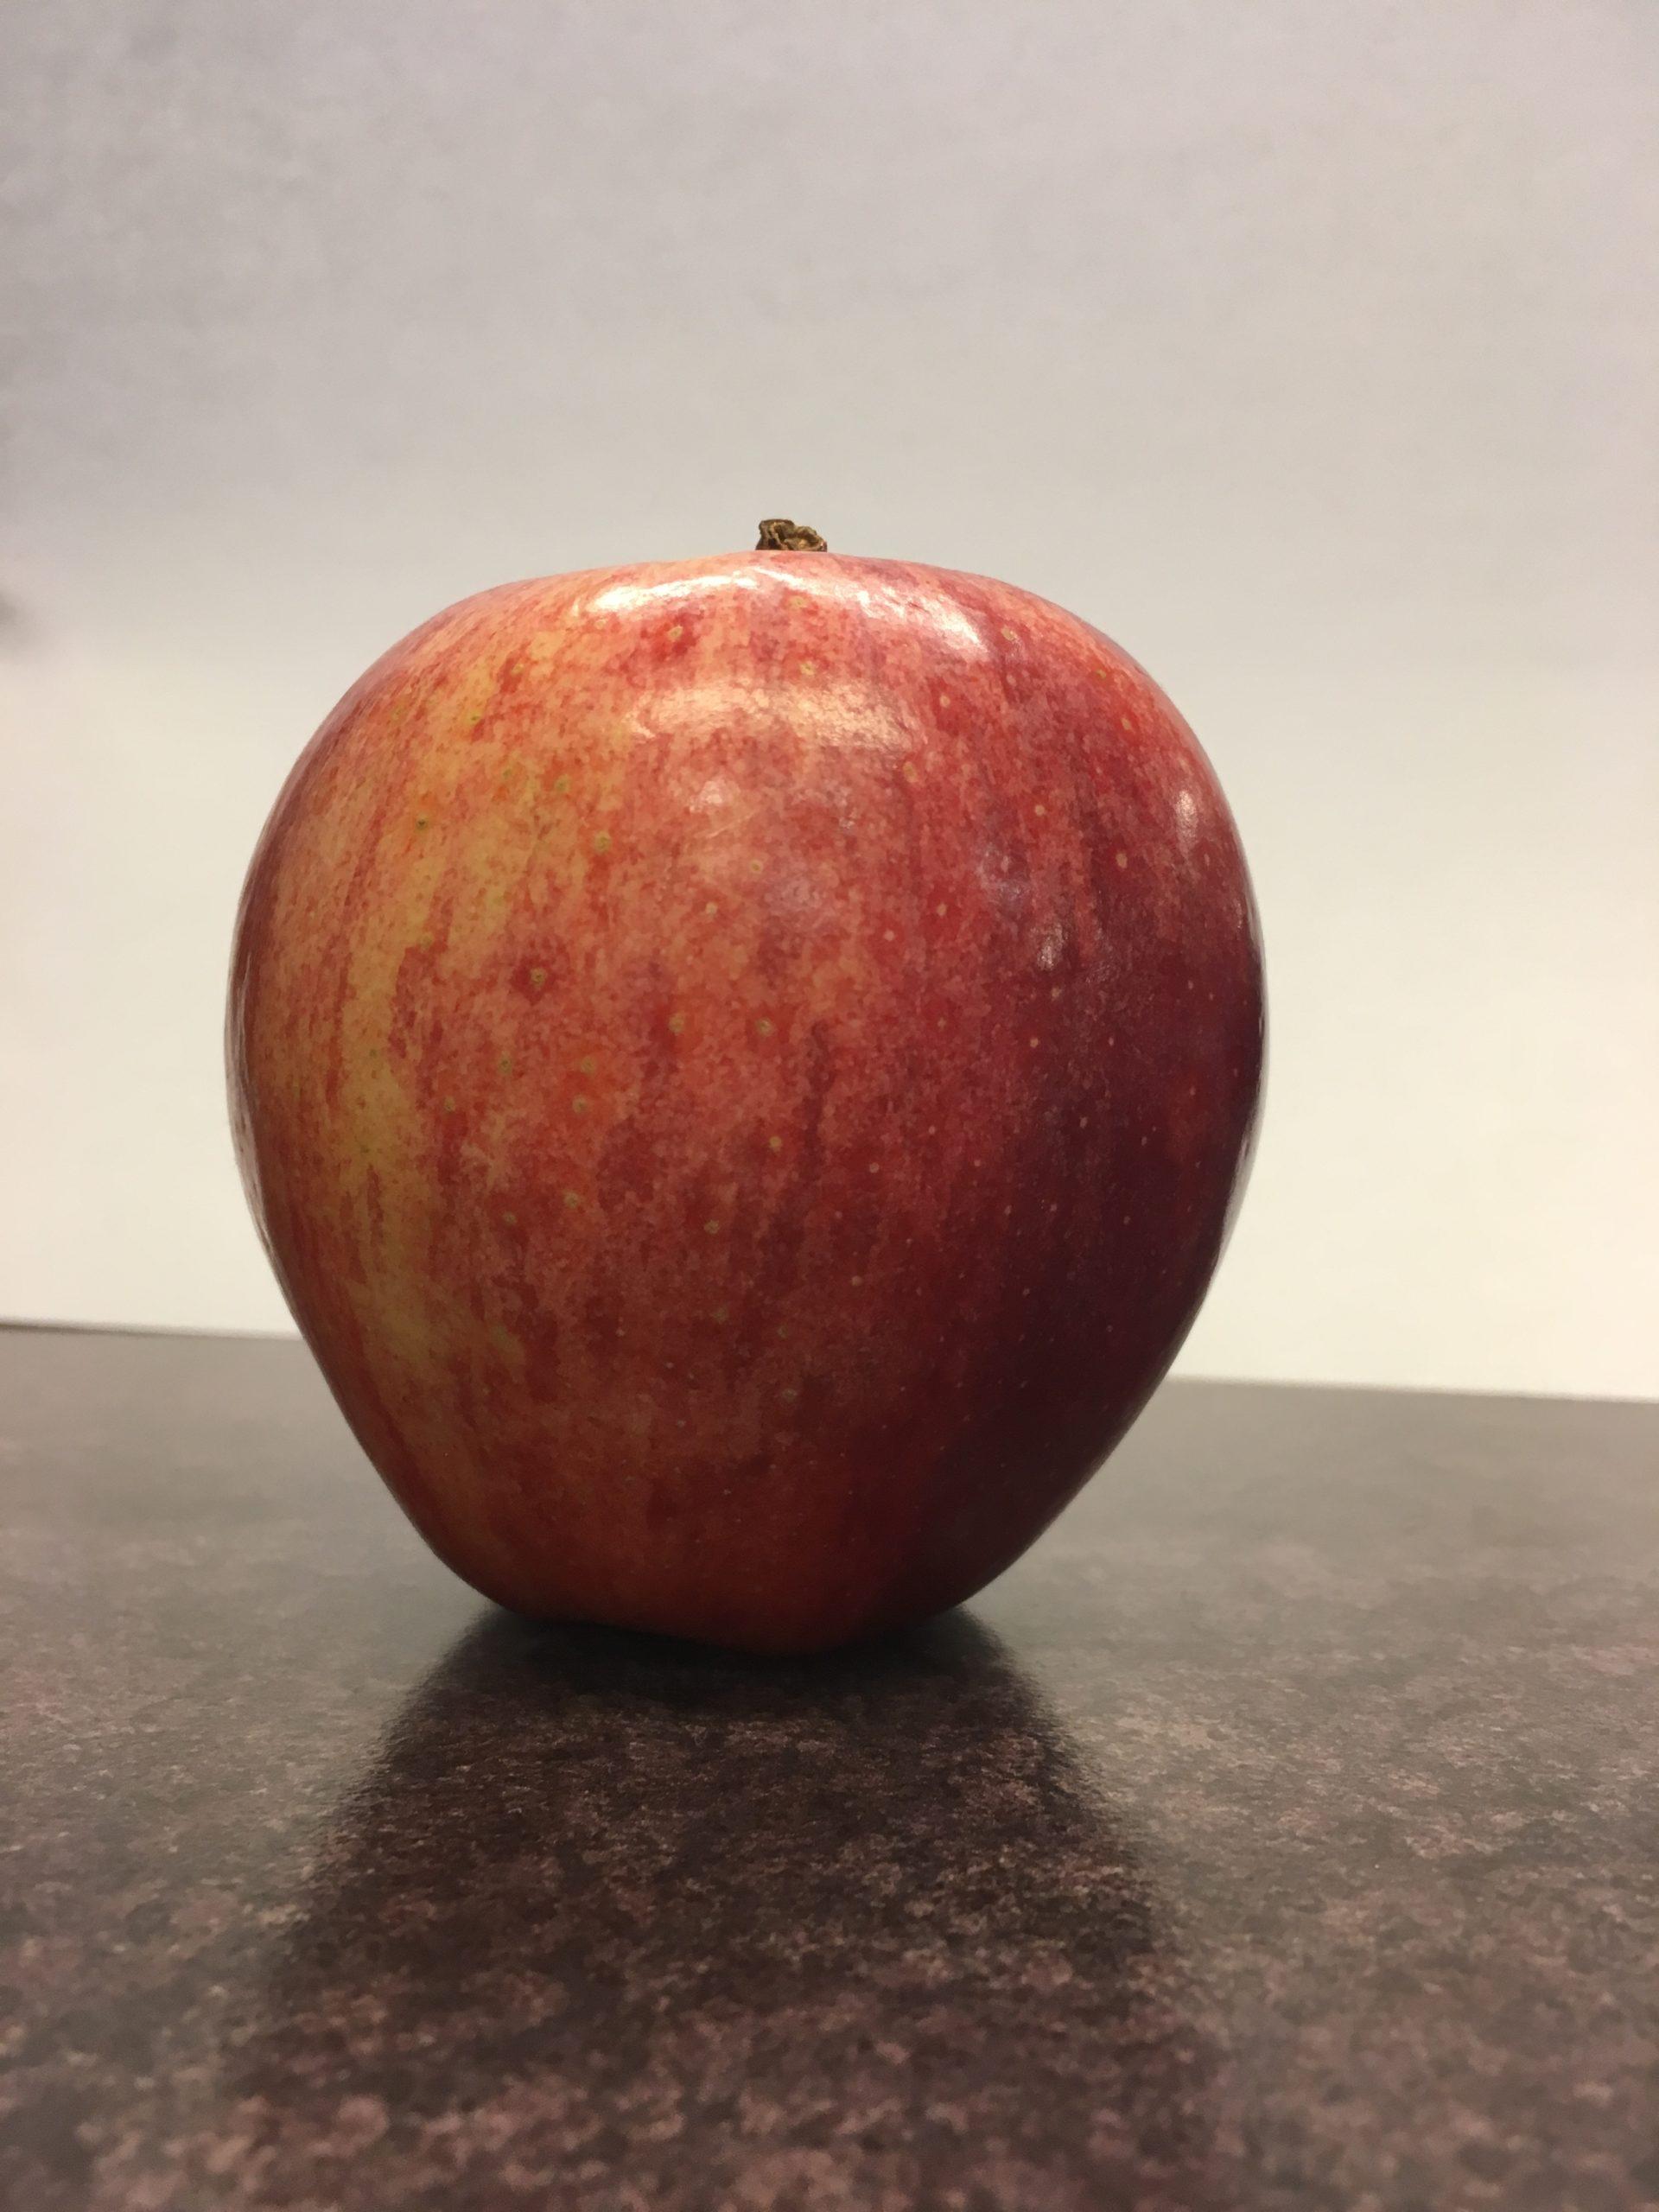 Ontario Apple Farmers Anticipate High Quality Crop Despite Lower Volume